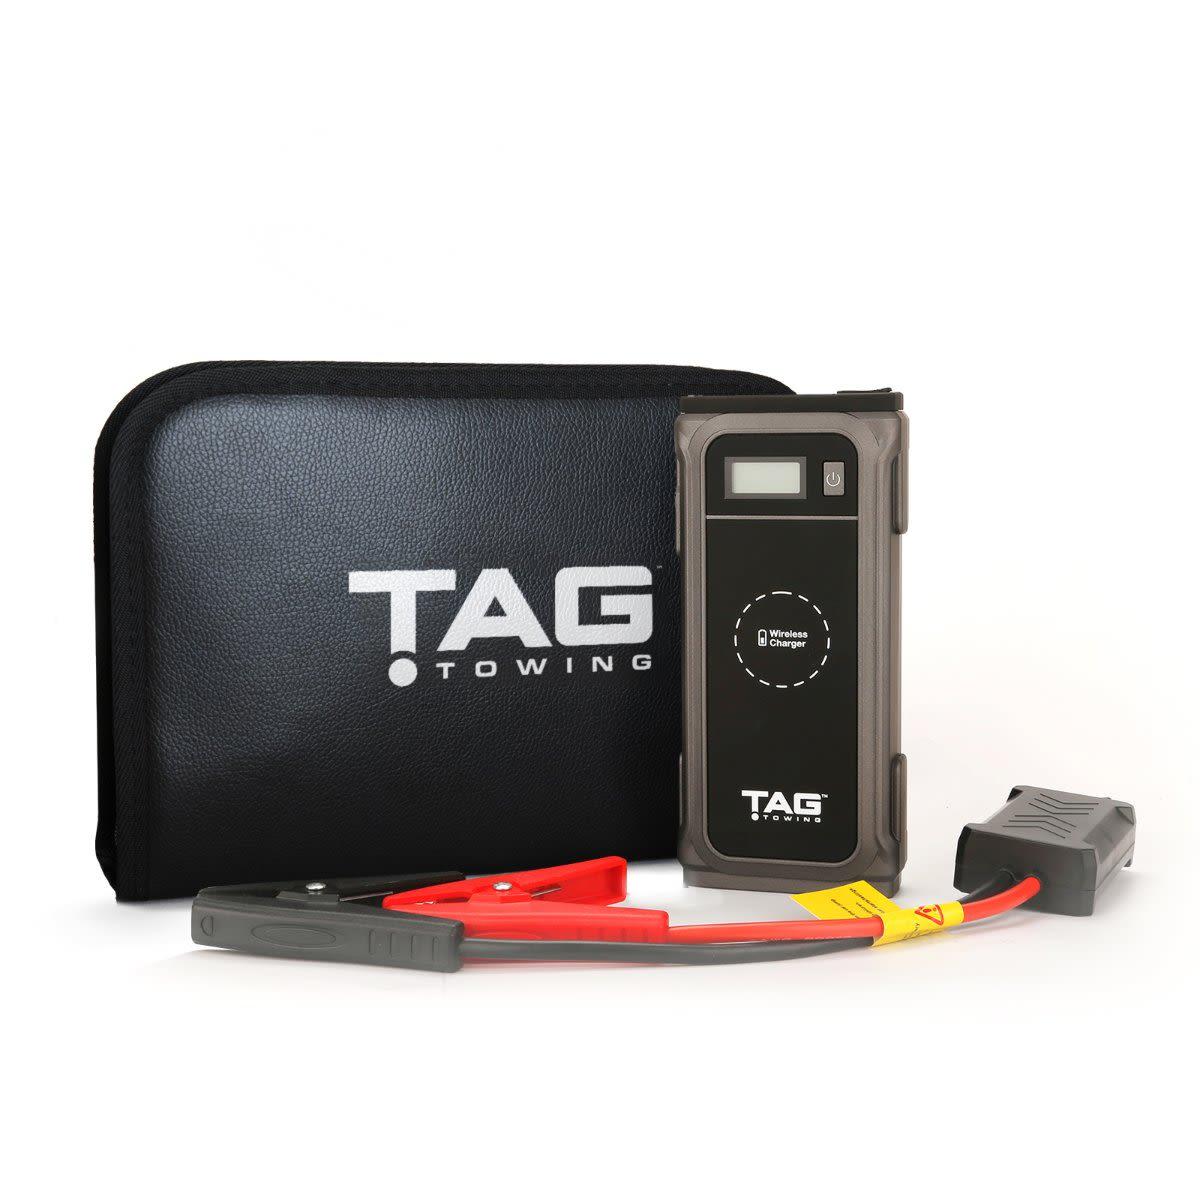 TAG Portable Jump-Starter & Multifunction Charger 12000mAh